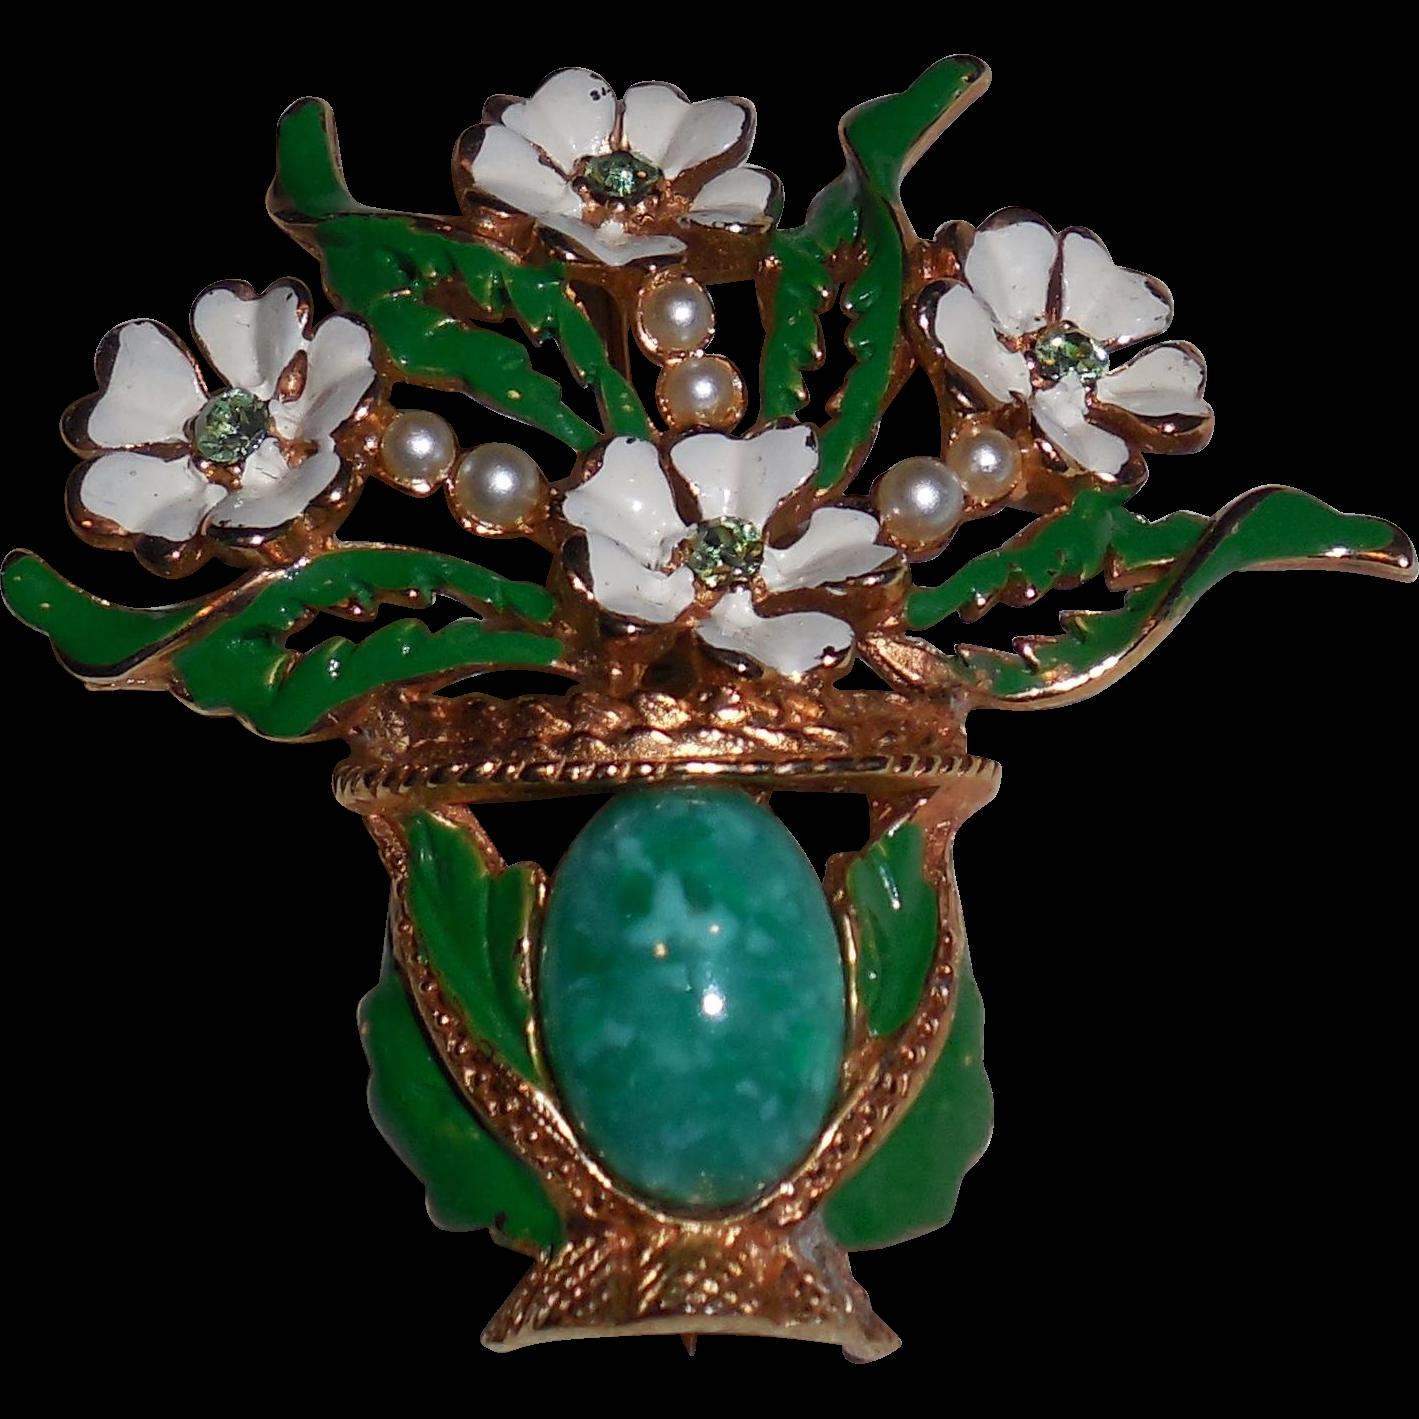 KRAMER Flower Vase Pot Glass Faux Pearl Enamel Brooch Pin from Not Just MUSI Bows on Ruby Lane #RubyLane